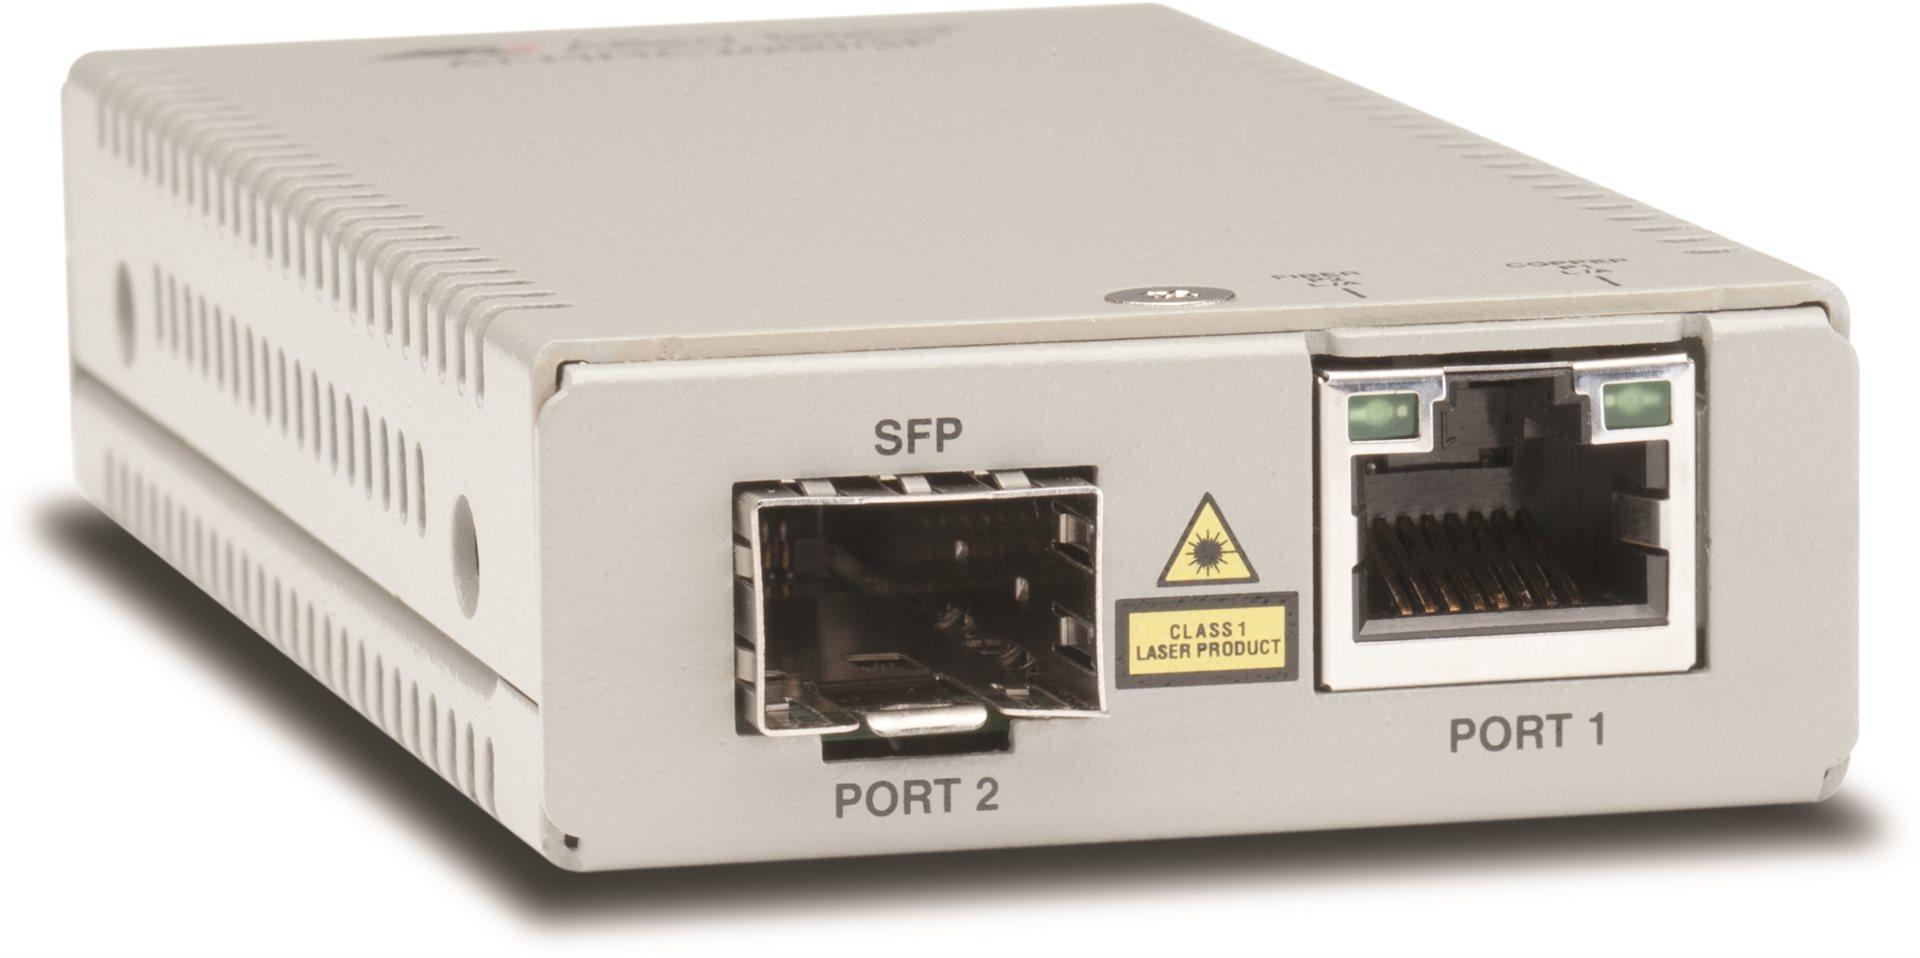 Allied Telesis AT-MMC2000/SP - AT-MMC2000/SP-960